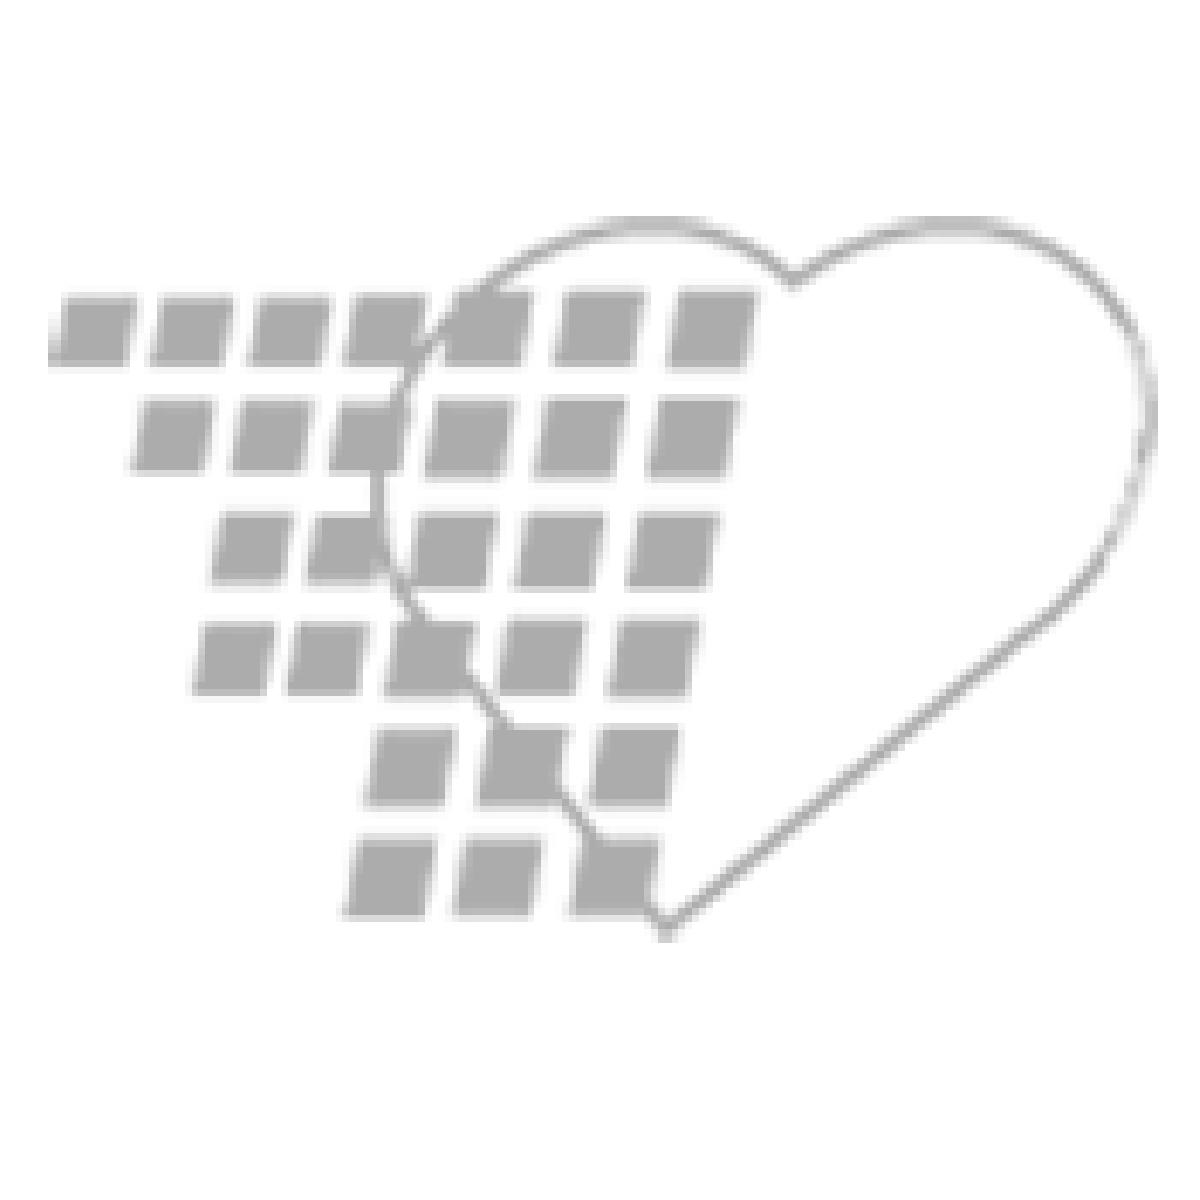 02-46-7000 - Hydrion® Insta-Chek Plastic pH Strip 0-13